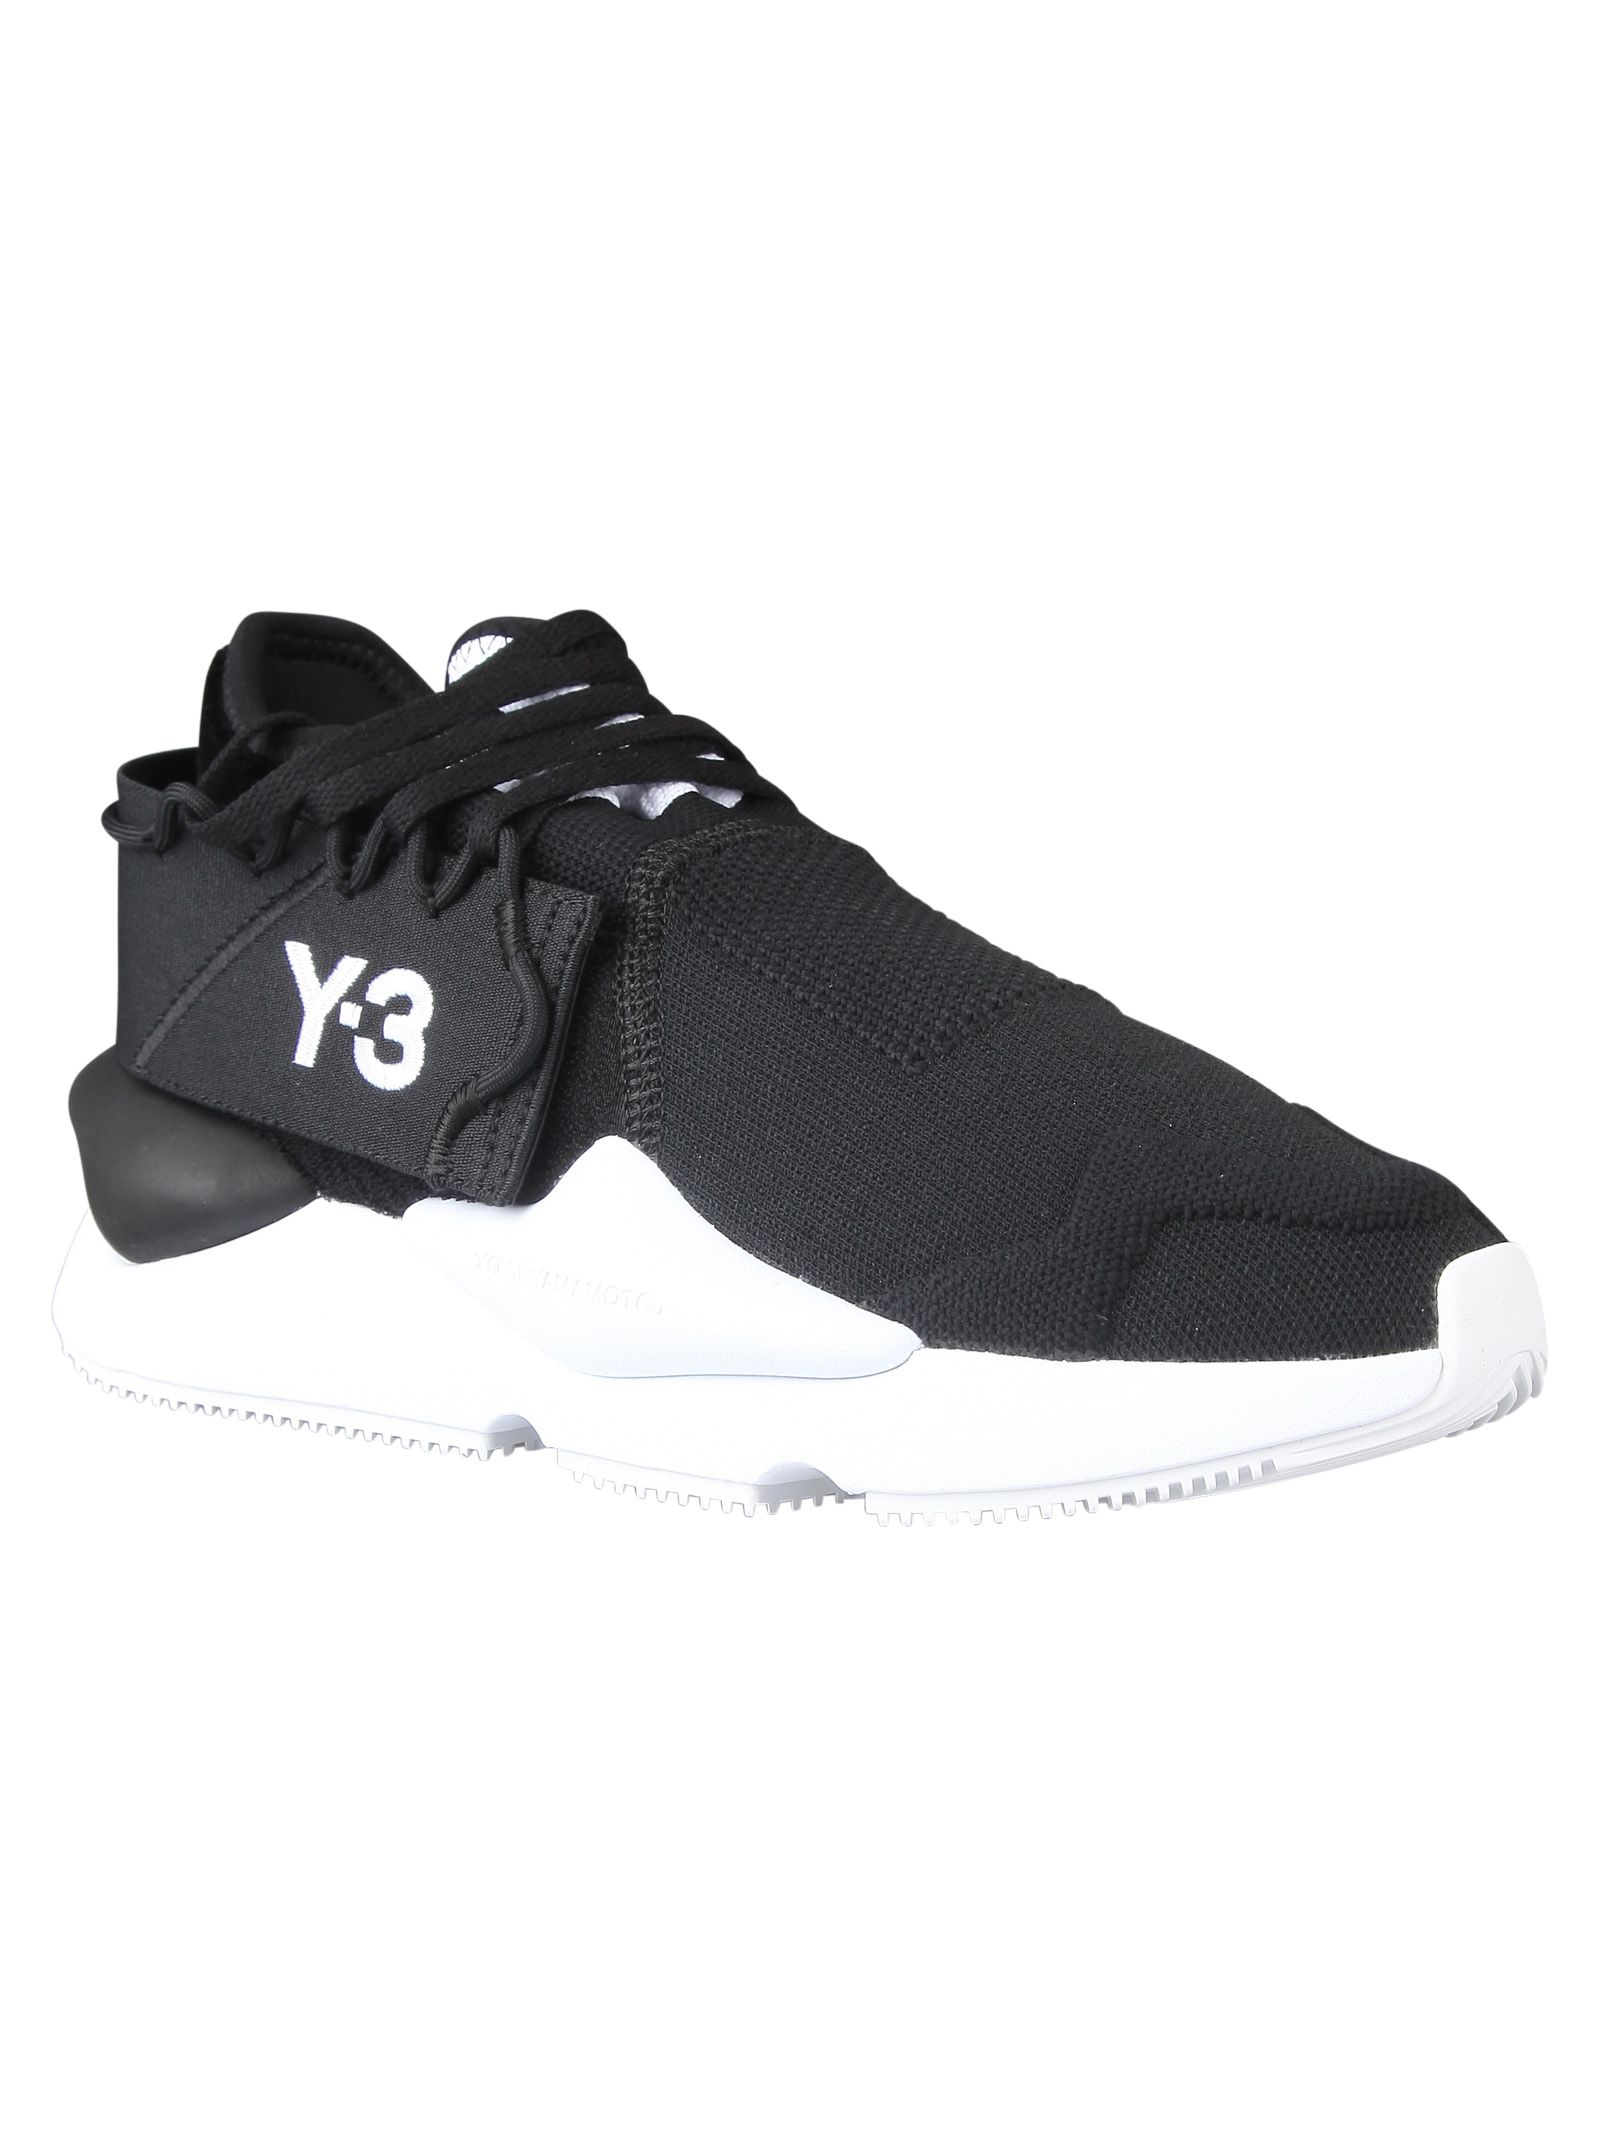 8cacc070b2035 Y-3 Y-3 Kaiwa Knit Sneakers - Core Black - 10835782